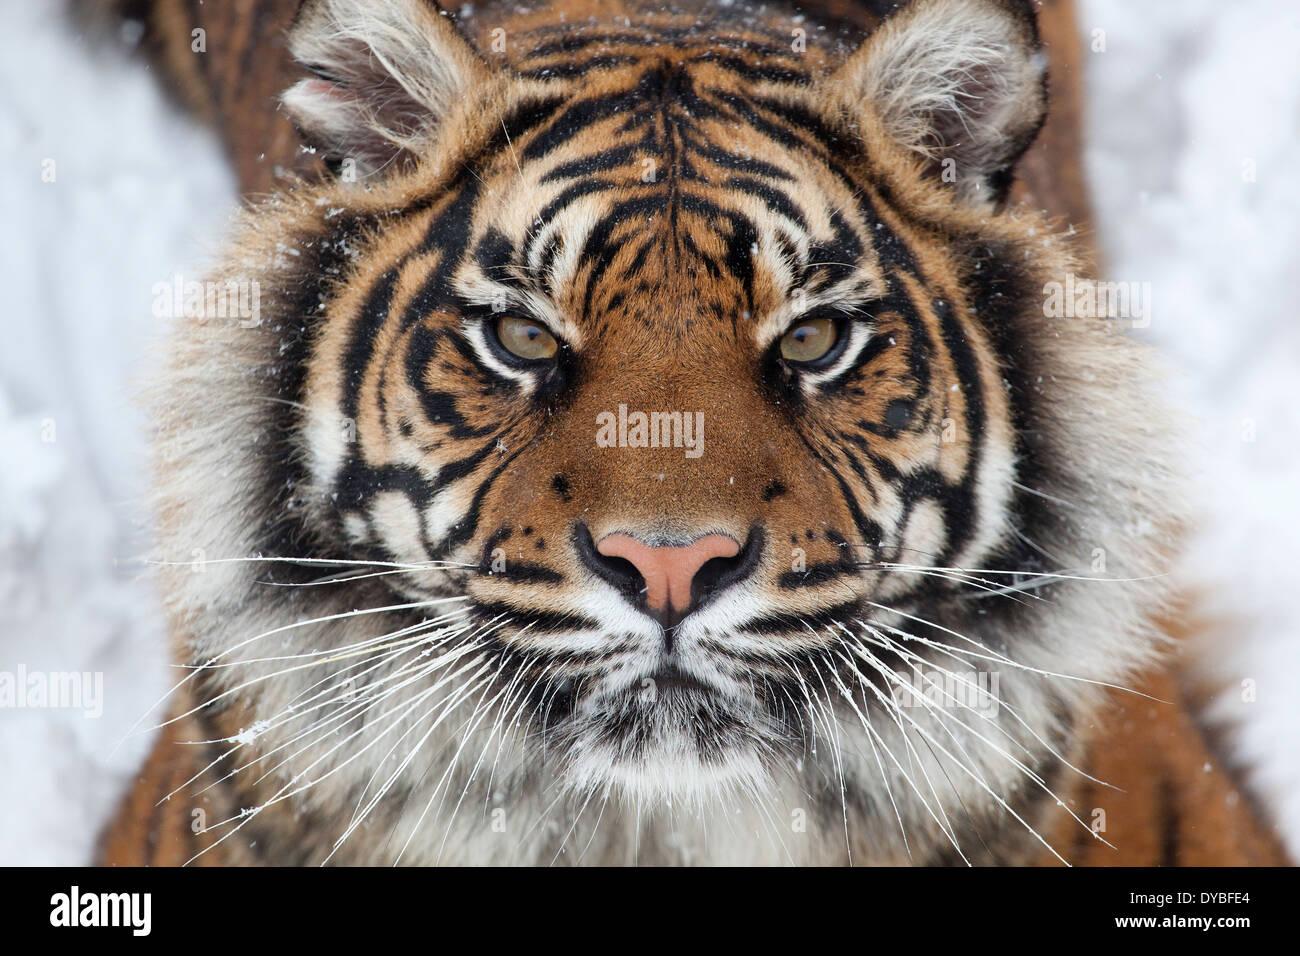 Tiger face Stock Photo: 68480444 - Alamy